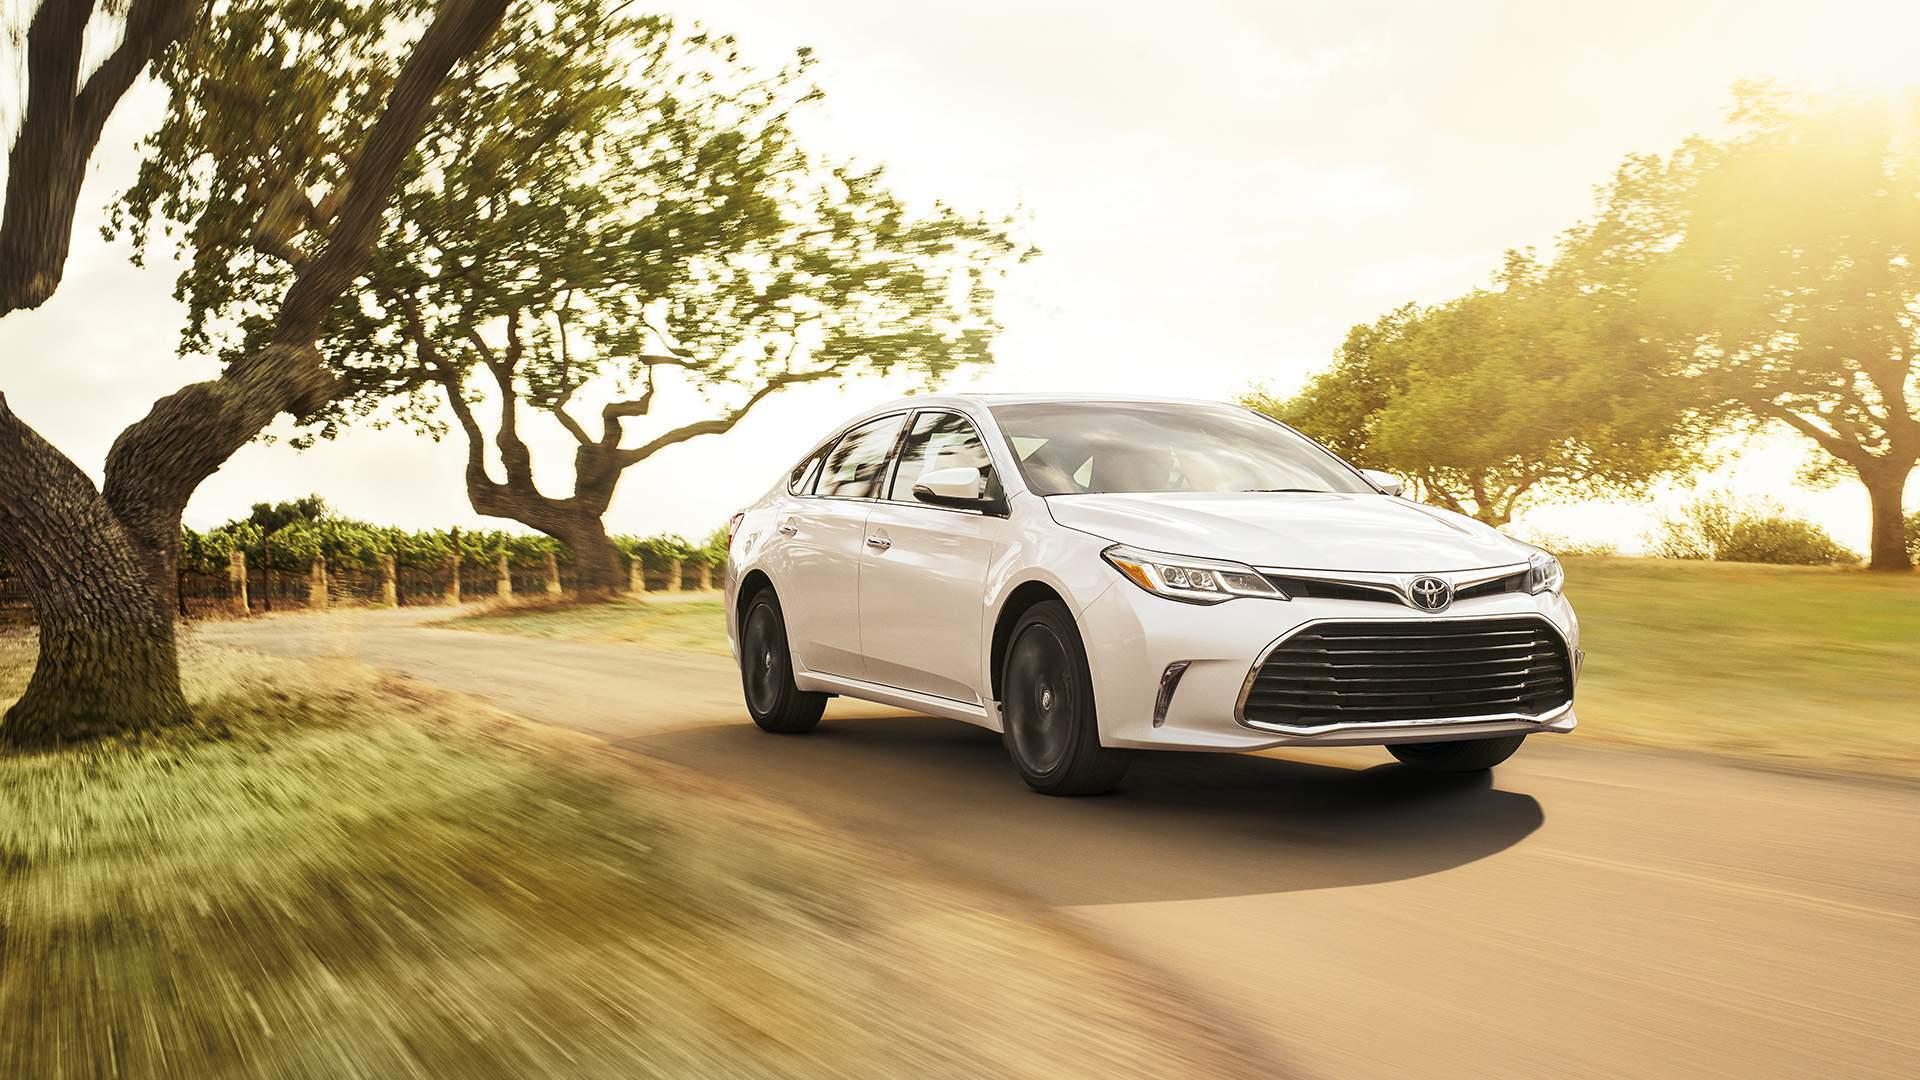 2017 Toyota Avalon Hybrid For Sale